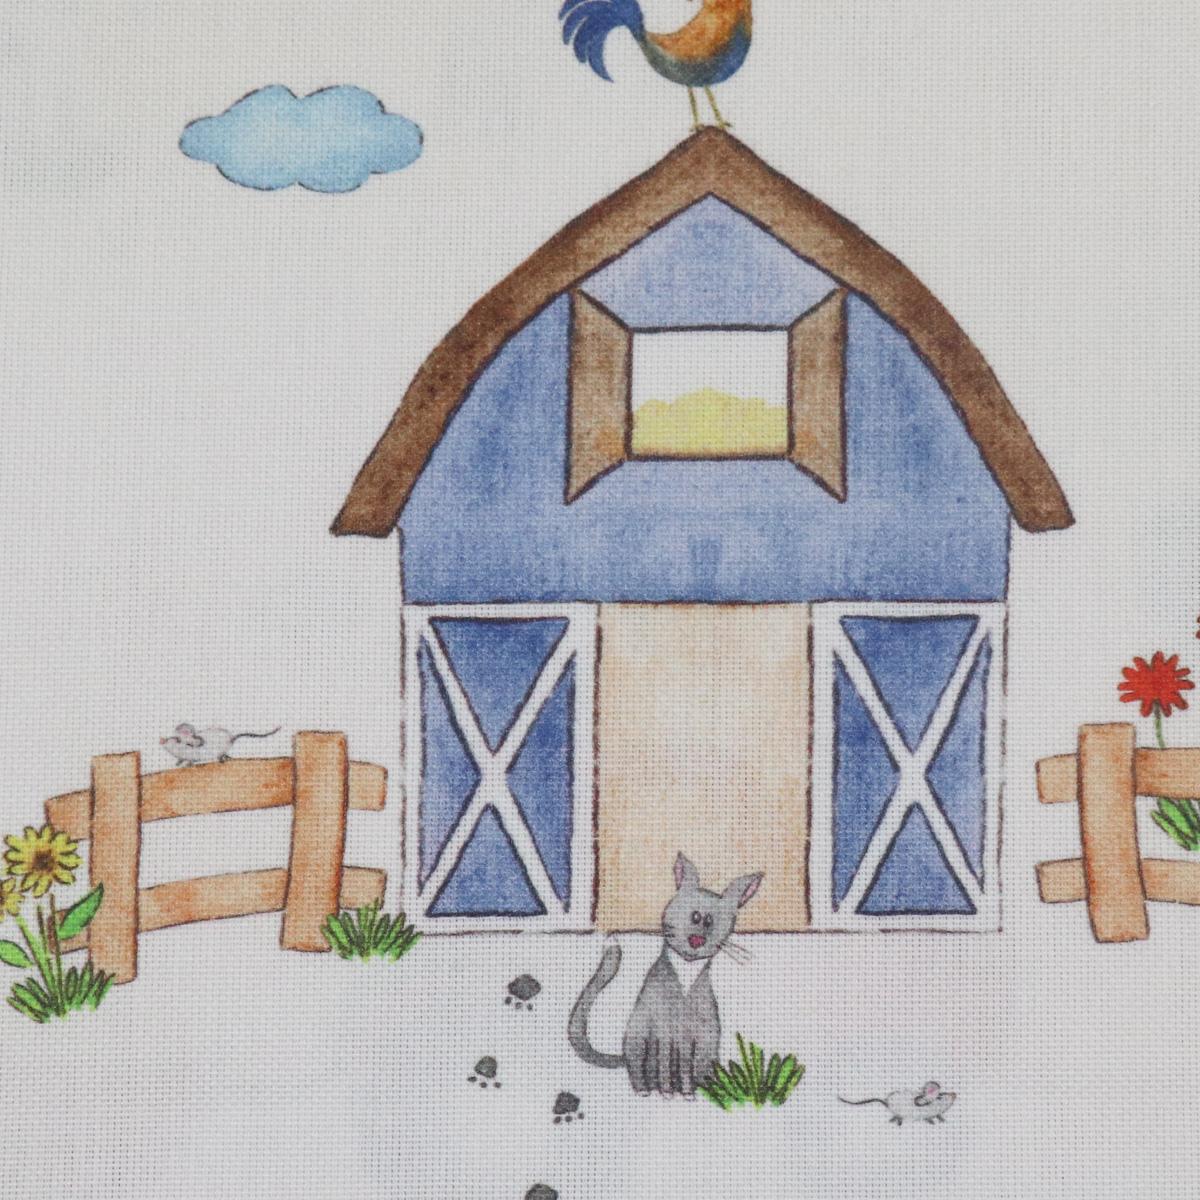 gardinenstoff stoff dekostoff hofgaudi bauernhof traktor tiere creme bunt alle stoffe stoffe. Black Bedroom Furniture Sets. Home Design Ideas